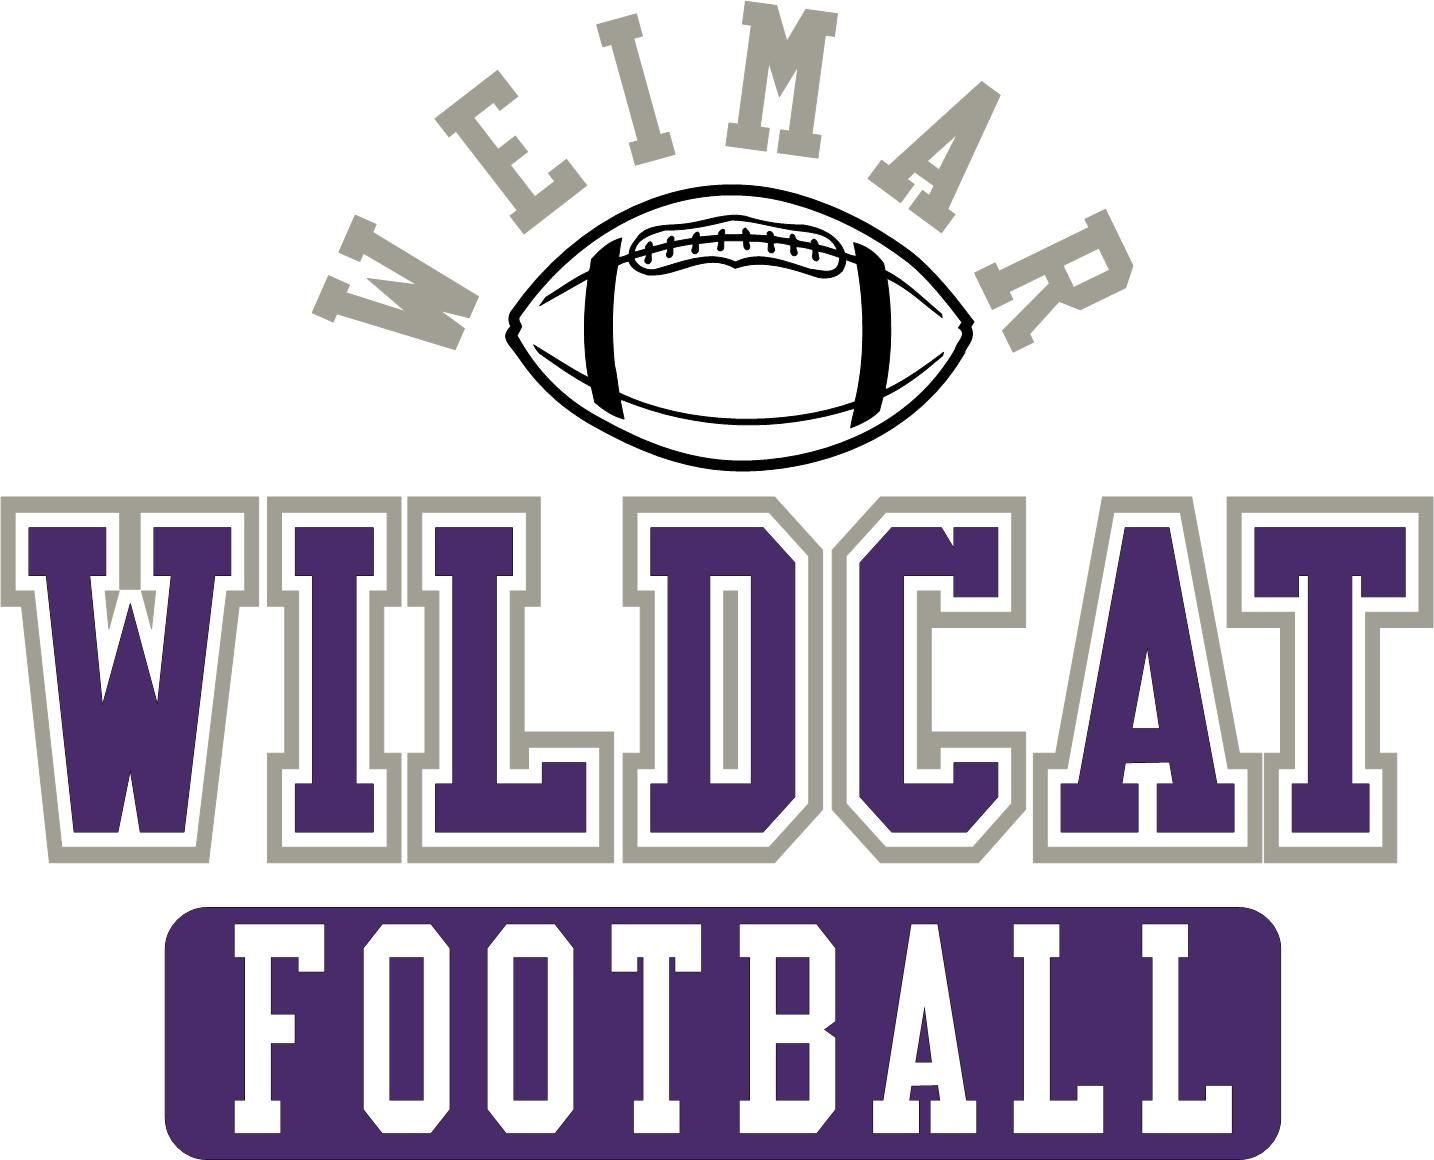 Football Football Wild Cats Wildcats Football